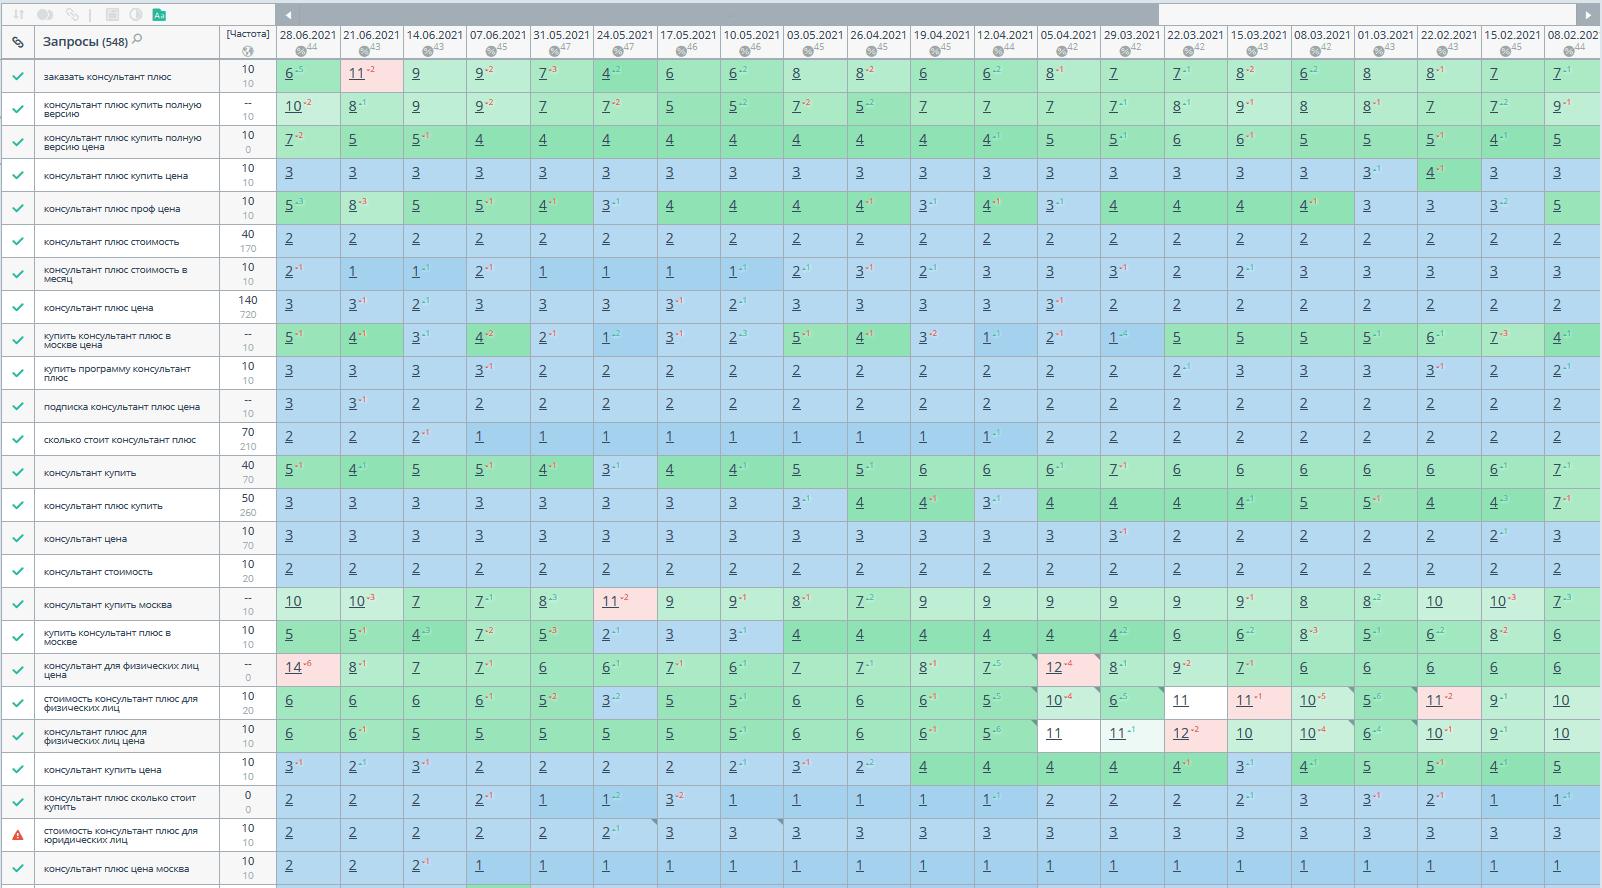 Статистика позиций в Google по региону Москва